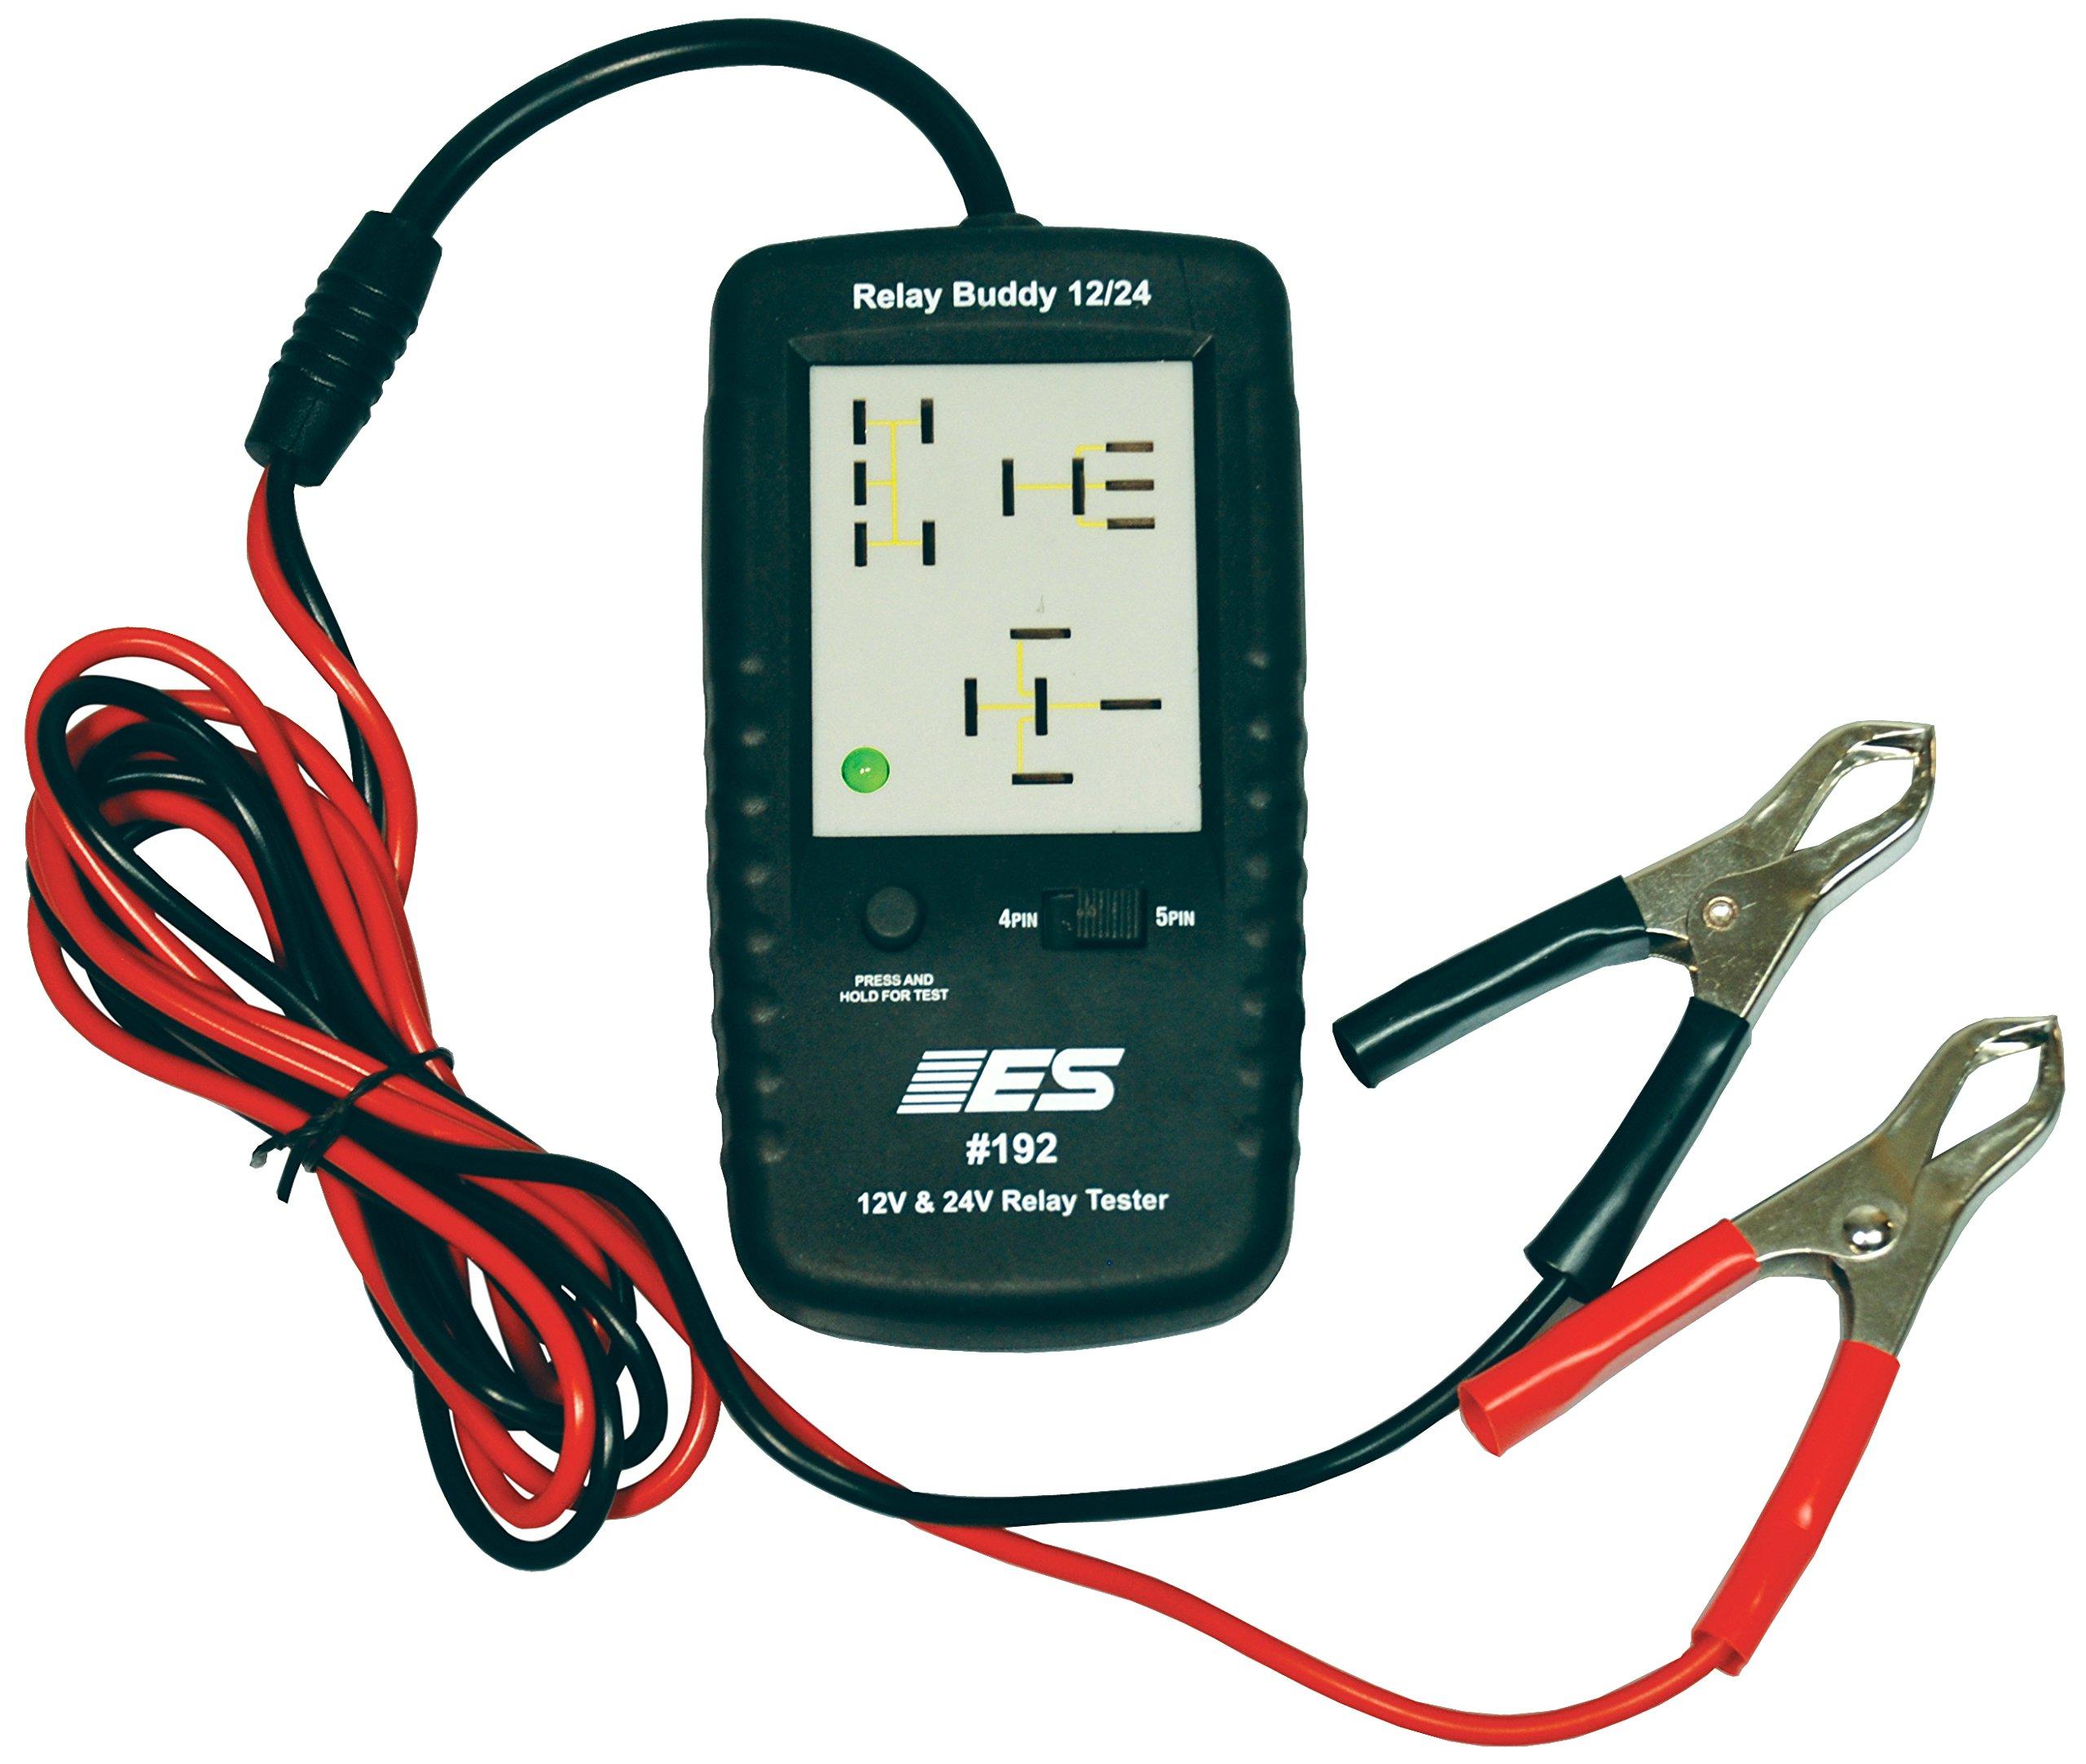 Electronic Specialties 192 Black 2.5'' x 5'' 12/24V Diagnostic Relay Buddy